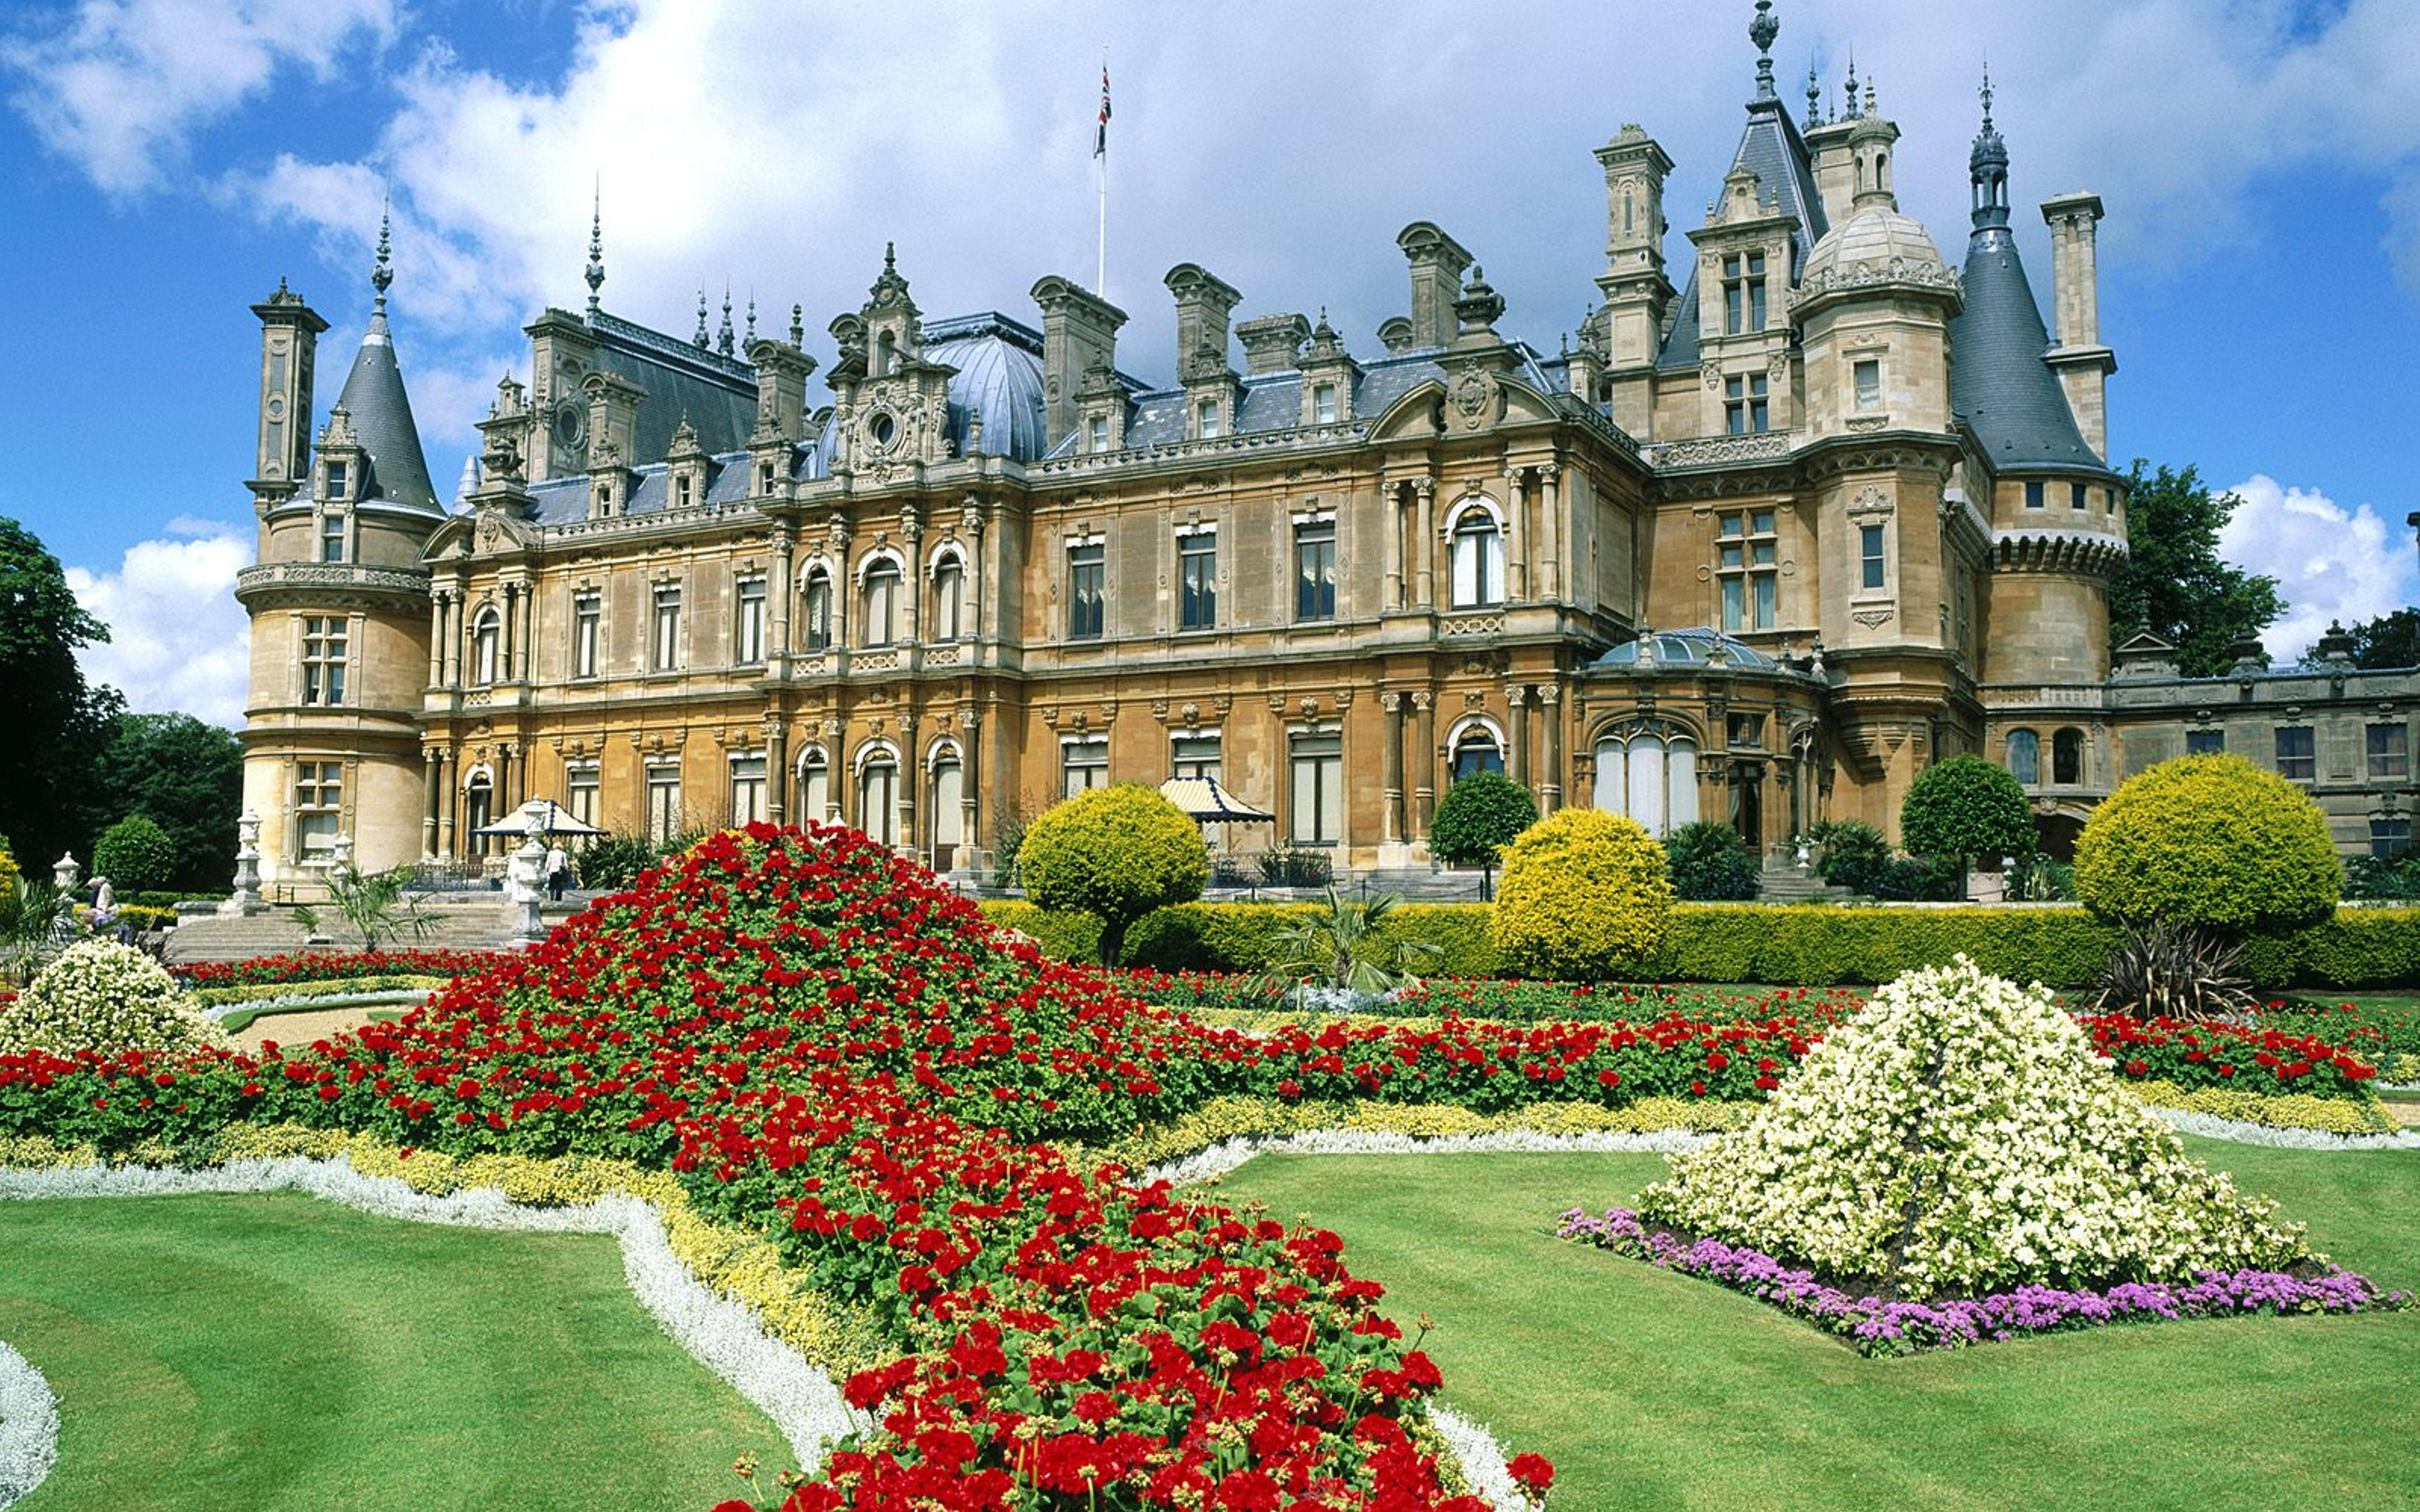 Buckingham Palace - A beautiful building and garden Wallpaper Download 5120x3200